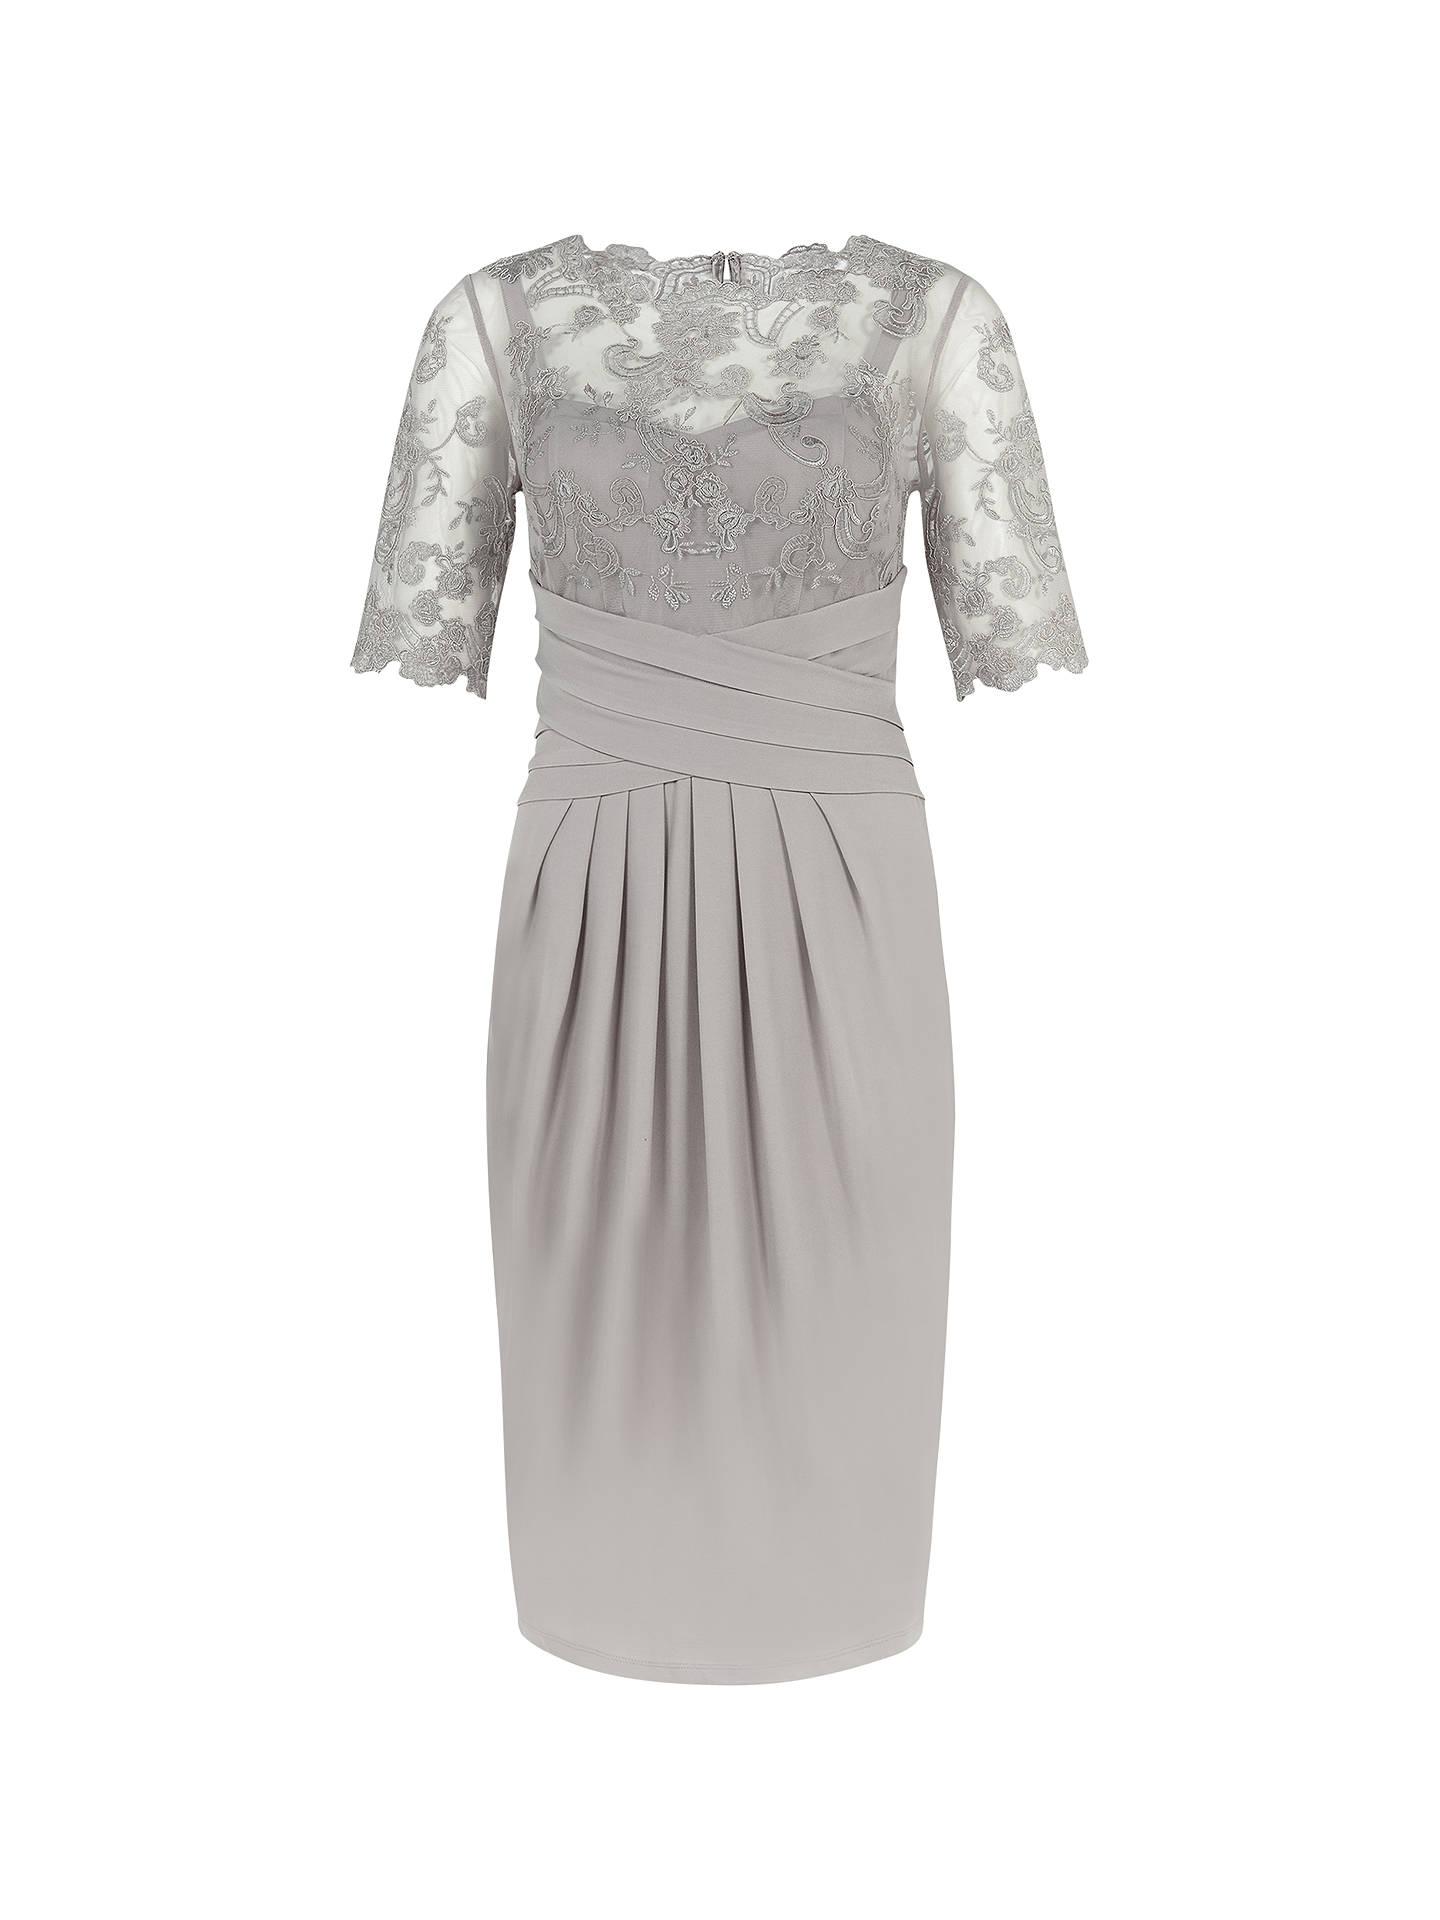 58fd11d4e7f Buy Kaliko Lace and Jersey Dress, Light Grey, 8 Online at johnlewis.com ...